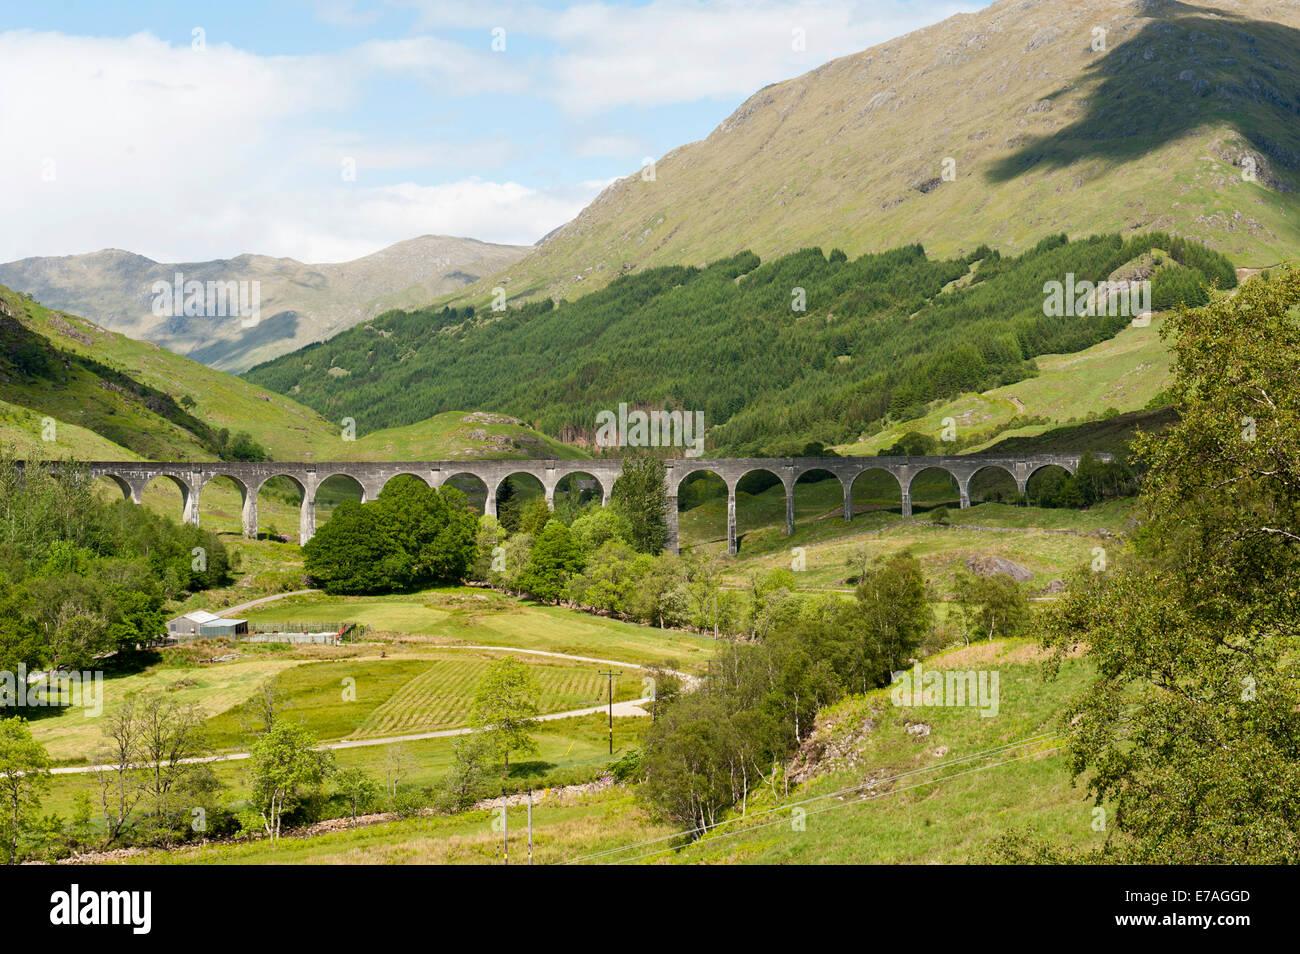 Bridge of the West Highland Line railway line, Glenfinnan Viaduct, Glenfinnan, Highlands, Scotland, United Kingdom - Stock Image